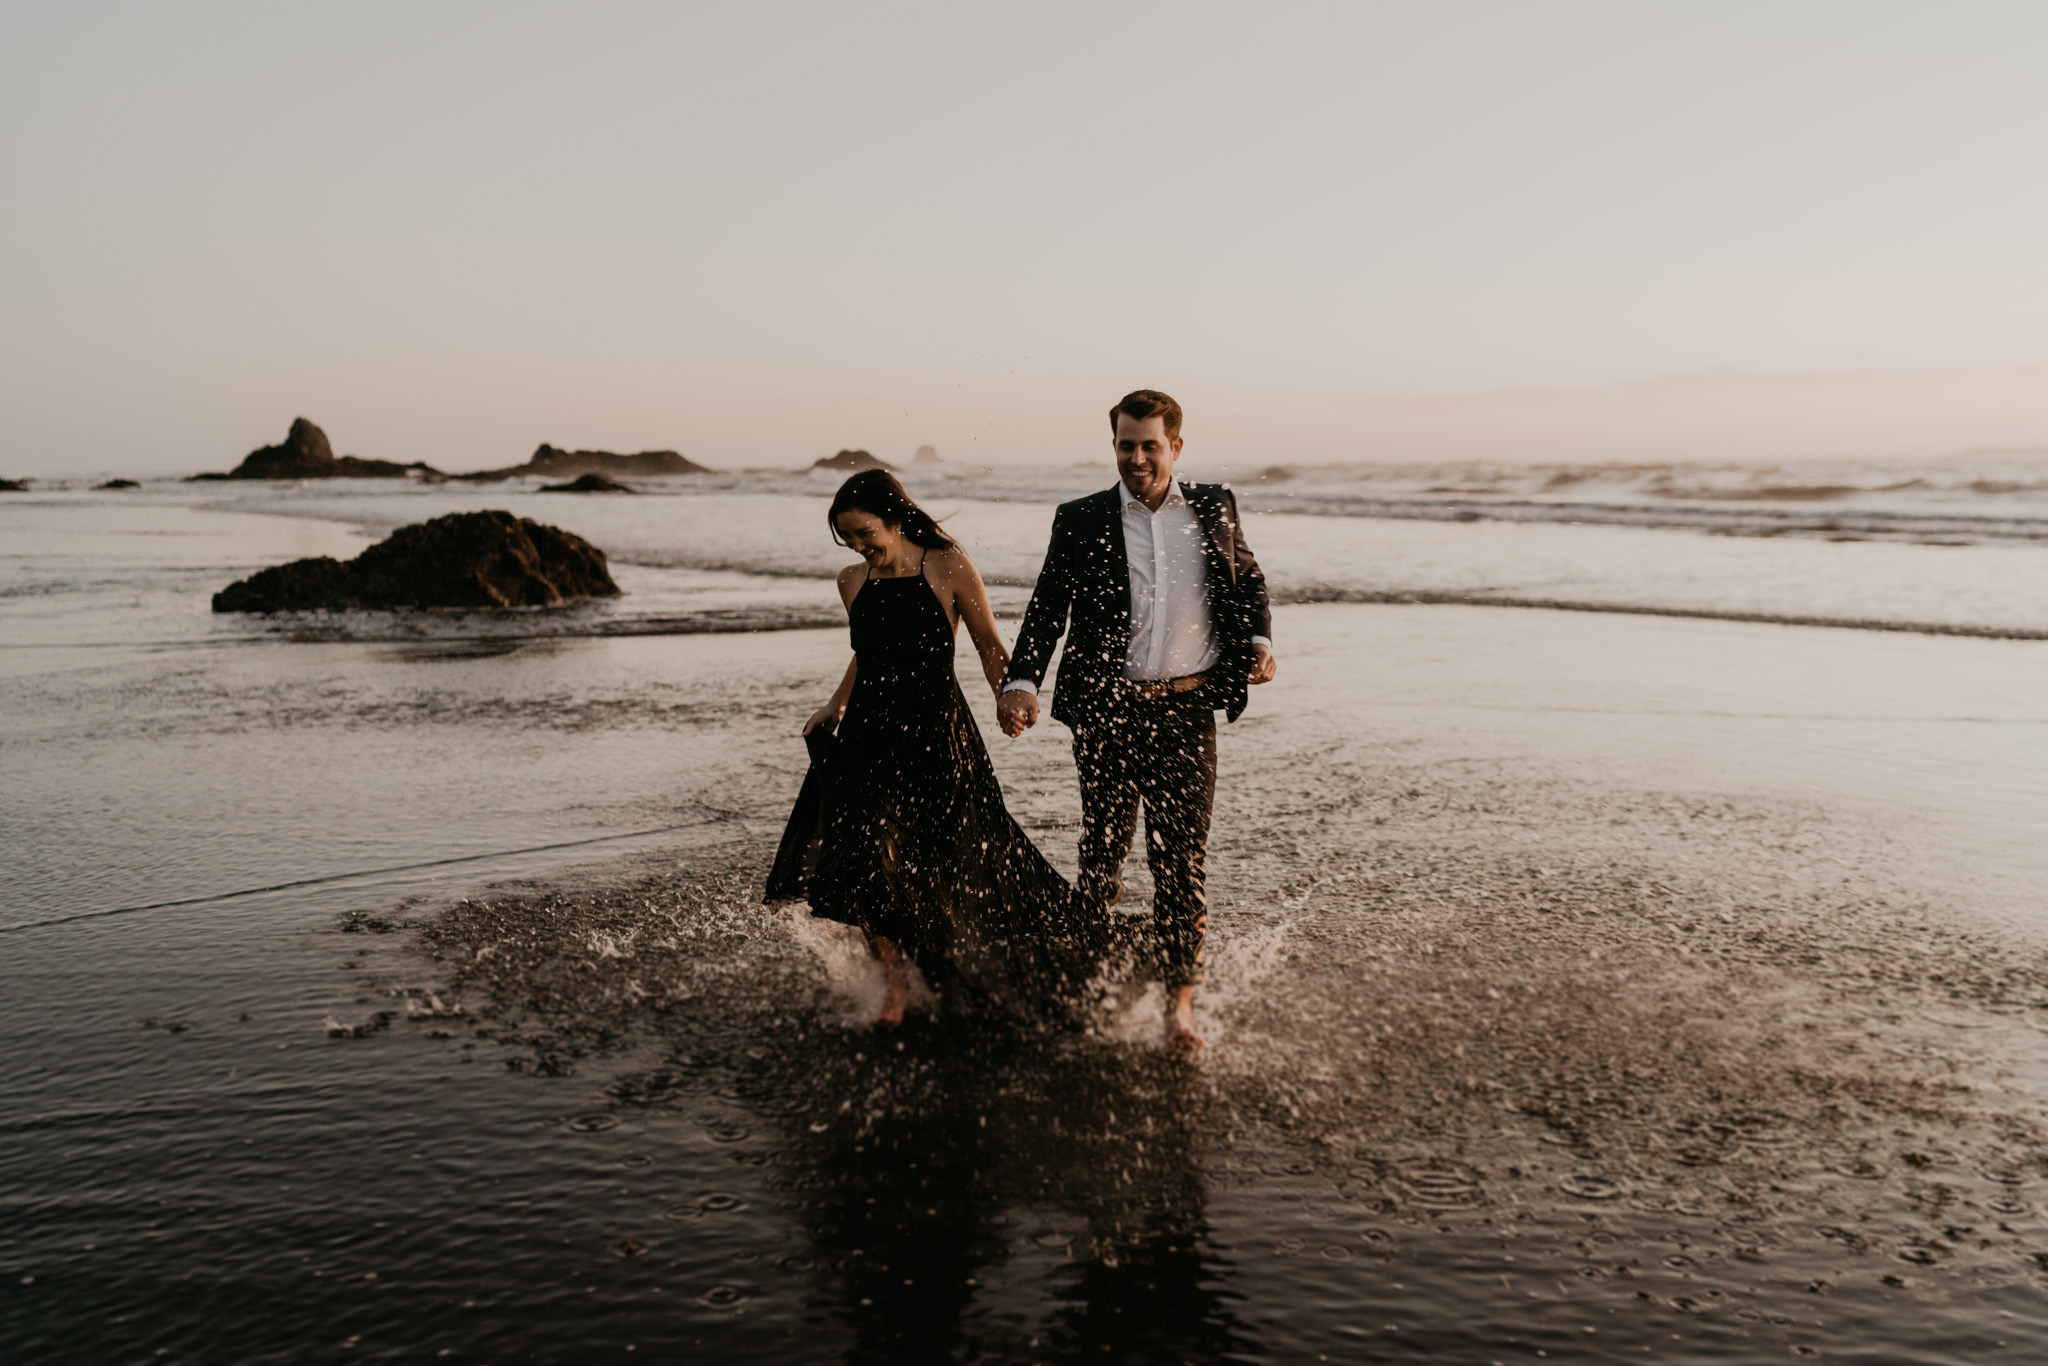 ruby-beach-la-push-rialto-washington-coast-olympic-peninsula-national-park-seattle-wedding-photographer-henrysdiary-henry-tieu-hey-darling-workshop-hdpresets-hd-presets-6.jpg